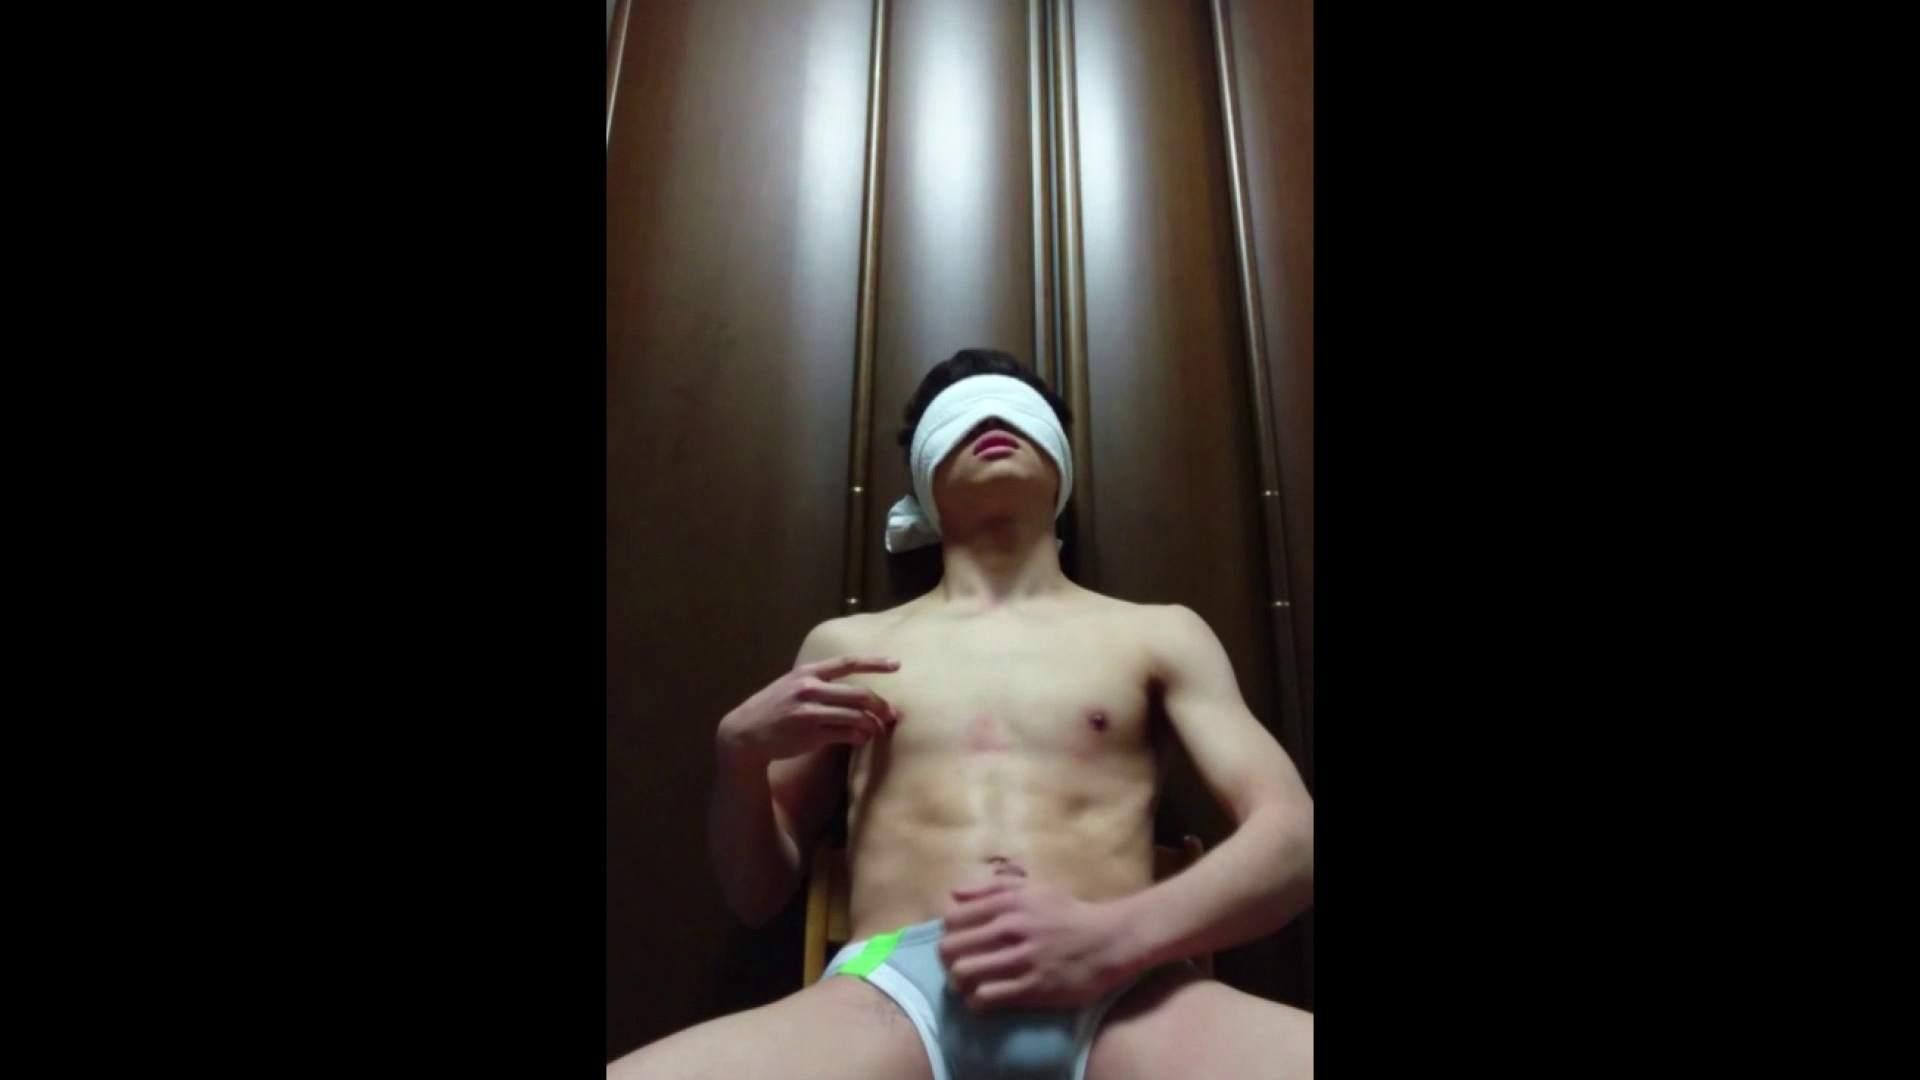 個人撮影 自慰の極意 Vol.21 無修正 男同士動画 93pic 78